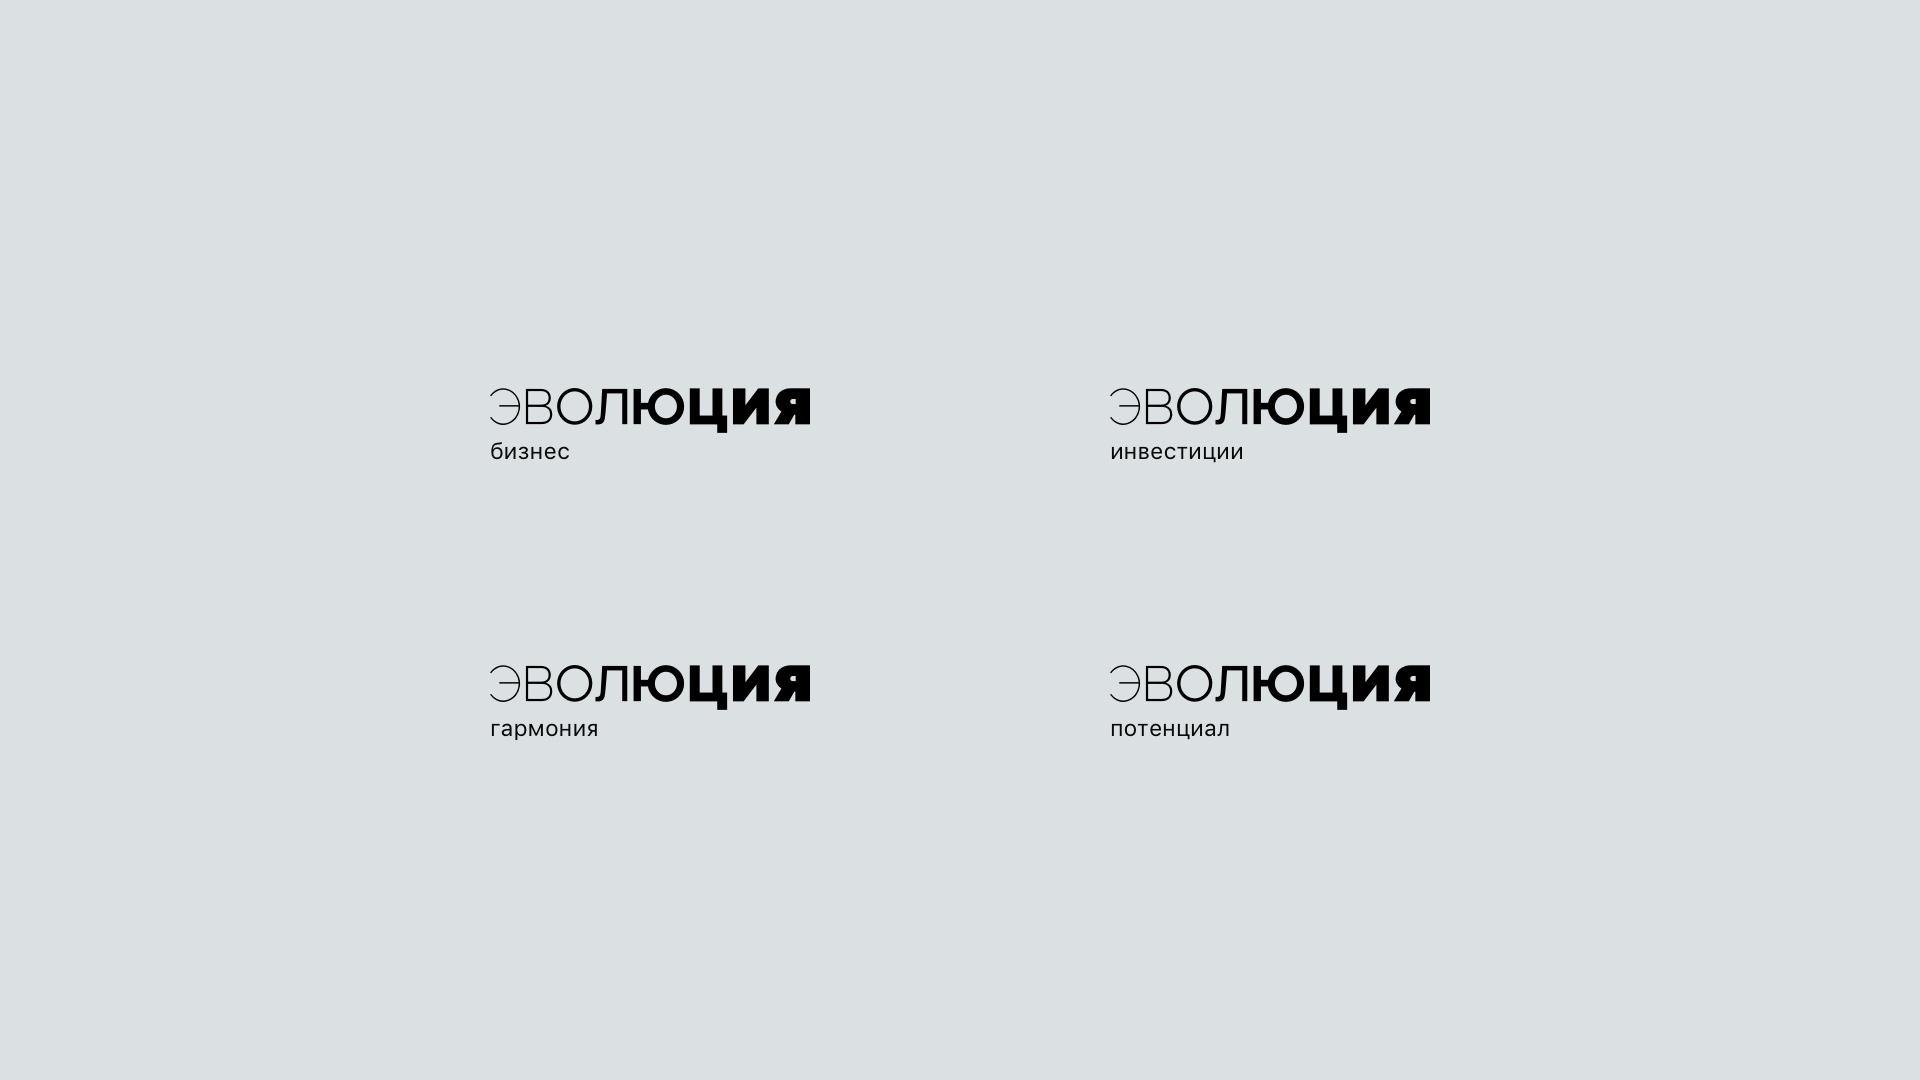 Разработать логотип для Онлайн-школы и сообщества фото f_2185bc1990936e7a.jpg